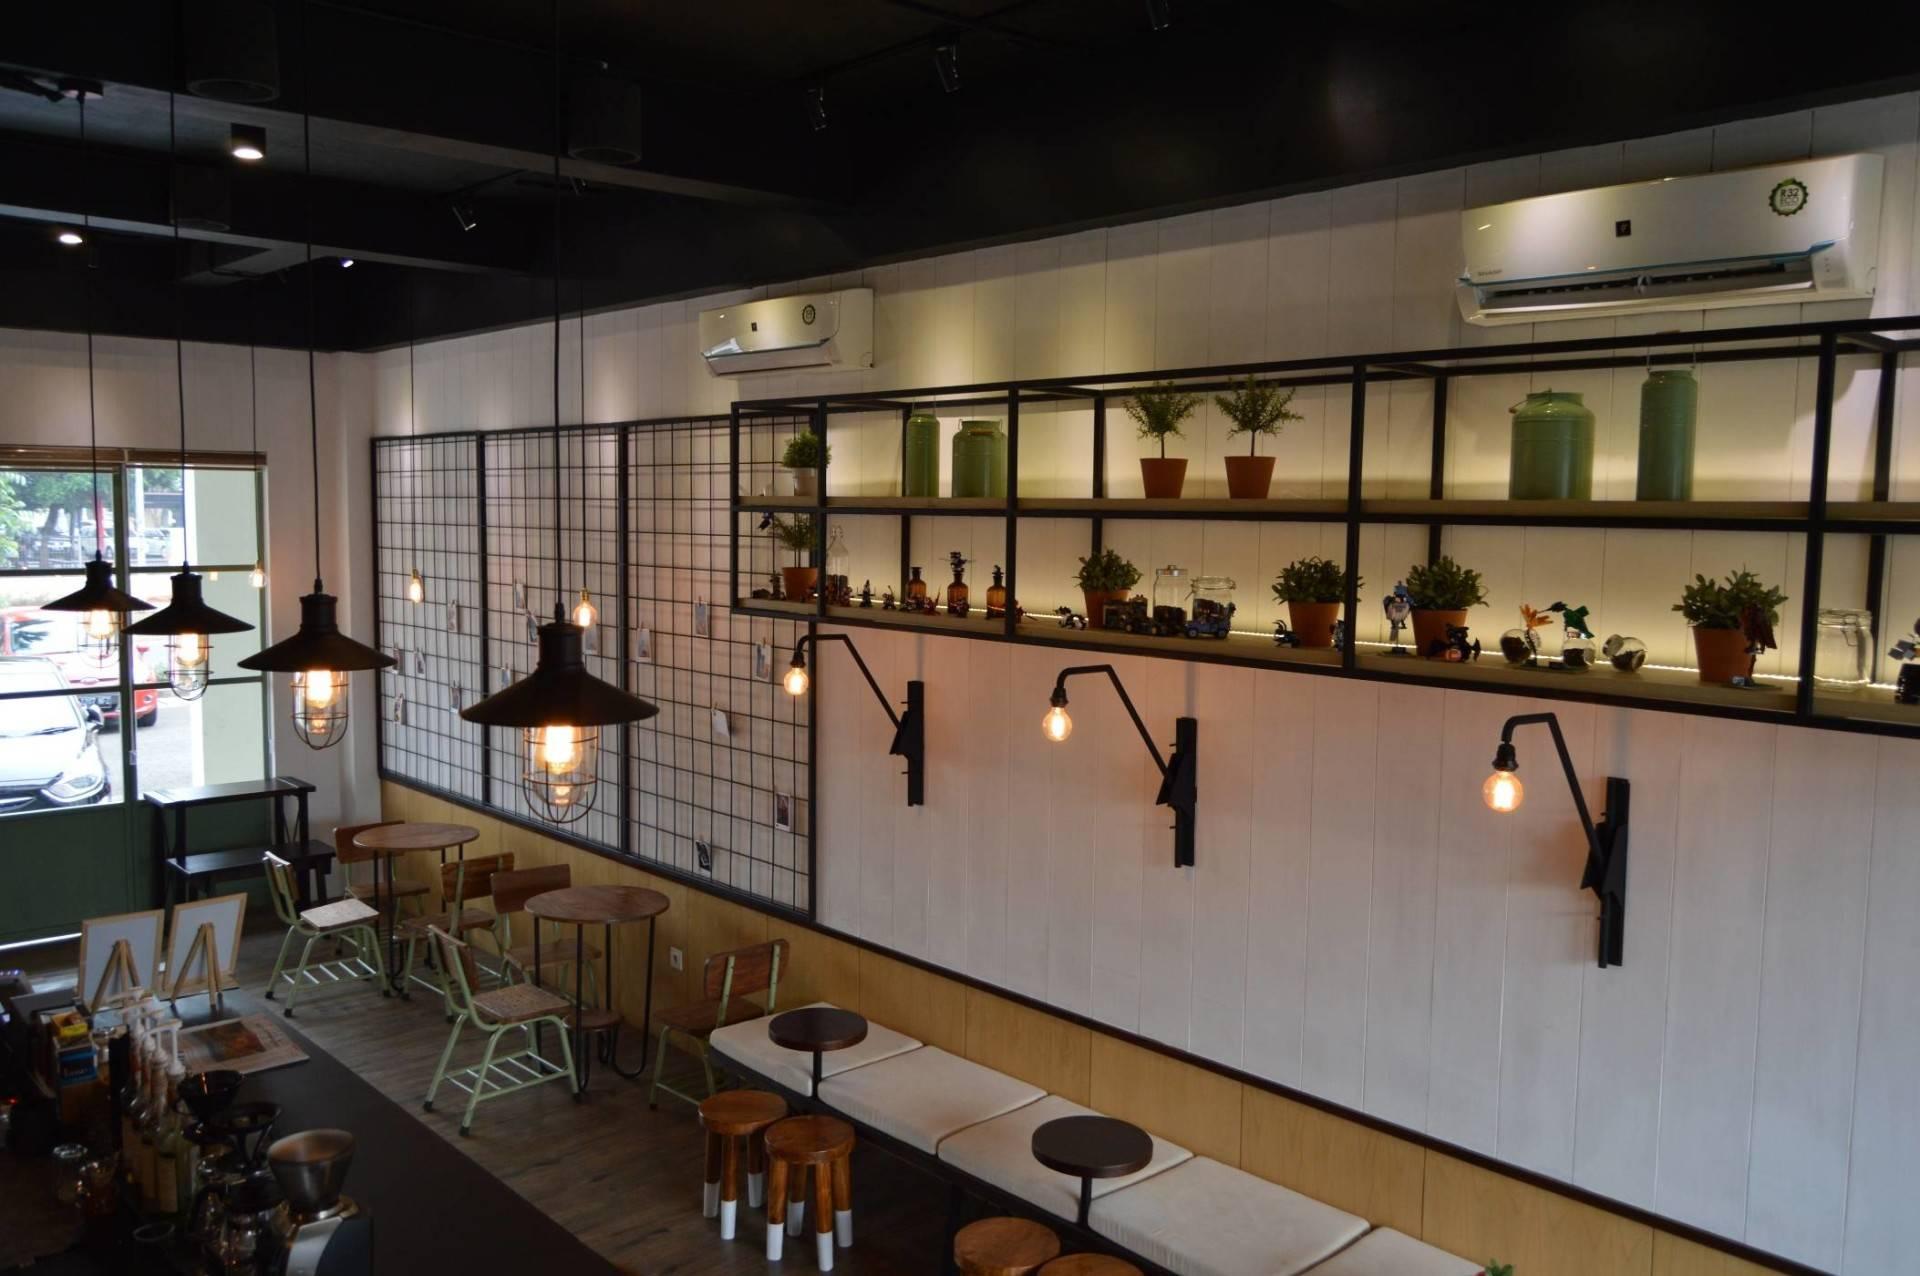 Pt Ergonomi Cipta Karya Voyage Coffee & Dessert Gading Serpong, Tangerang Gading Serpong, Tangerang Interior Minimalis  6983